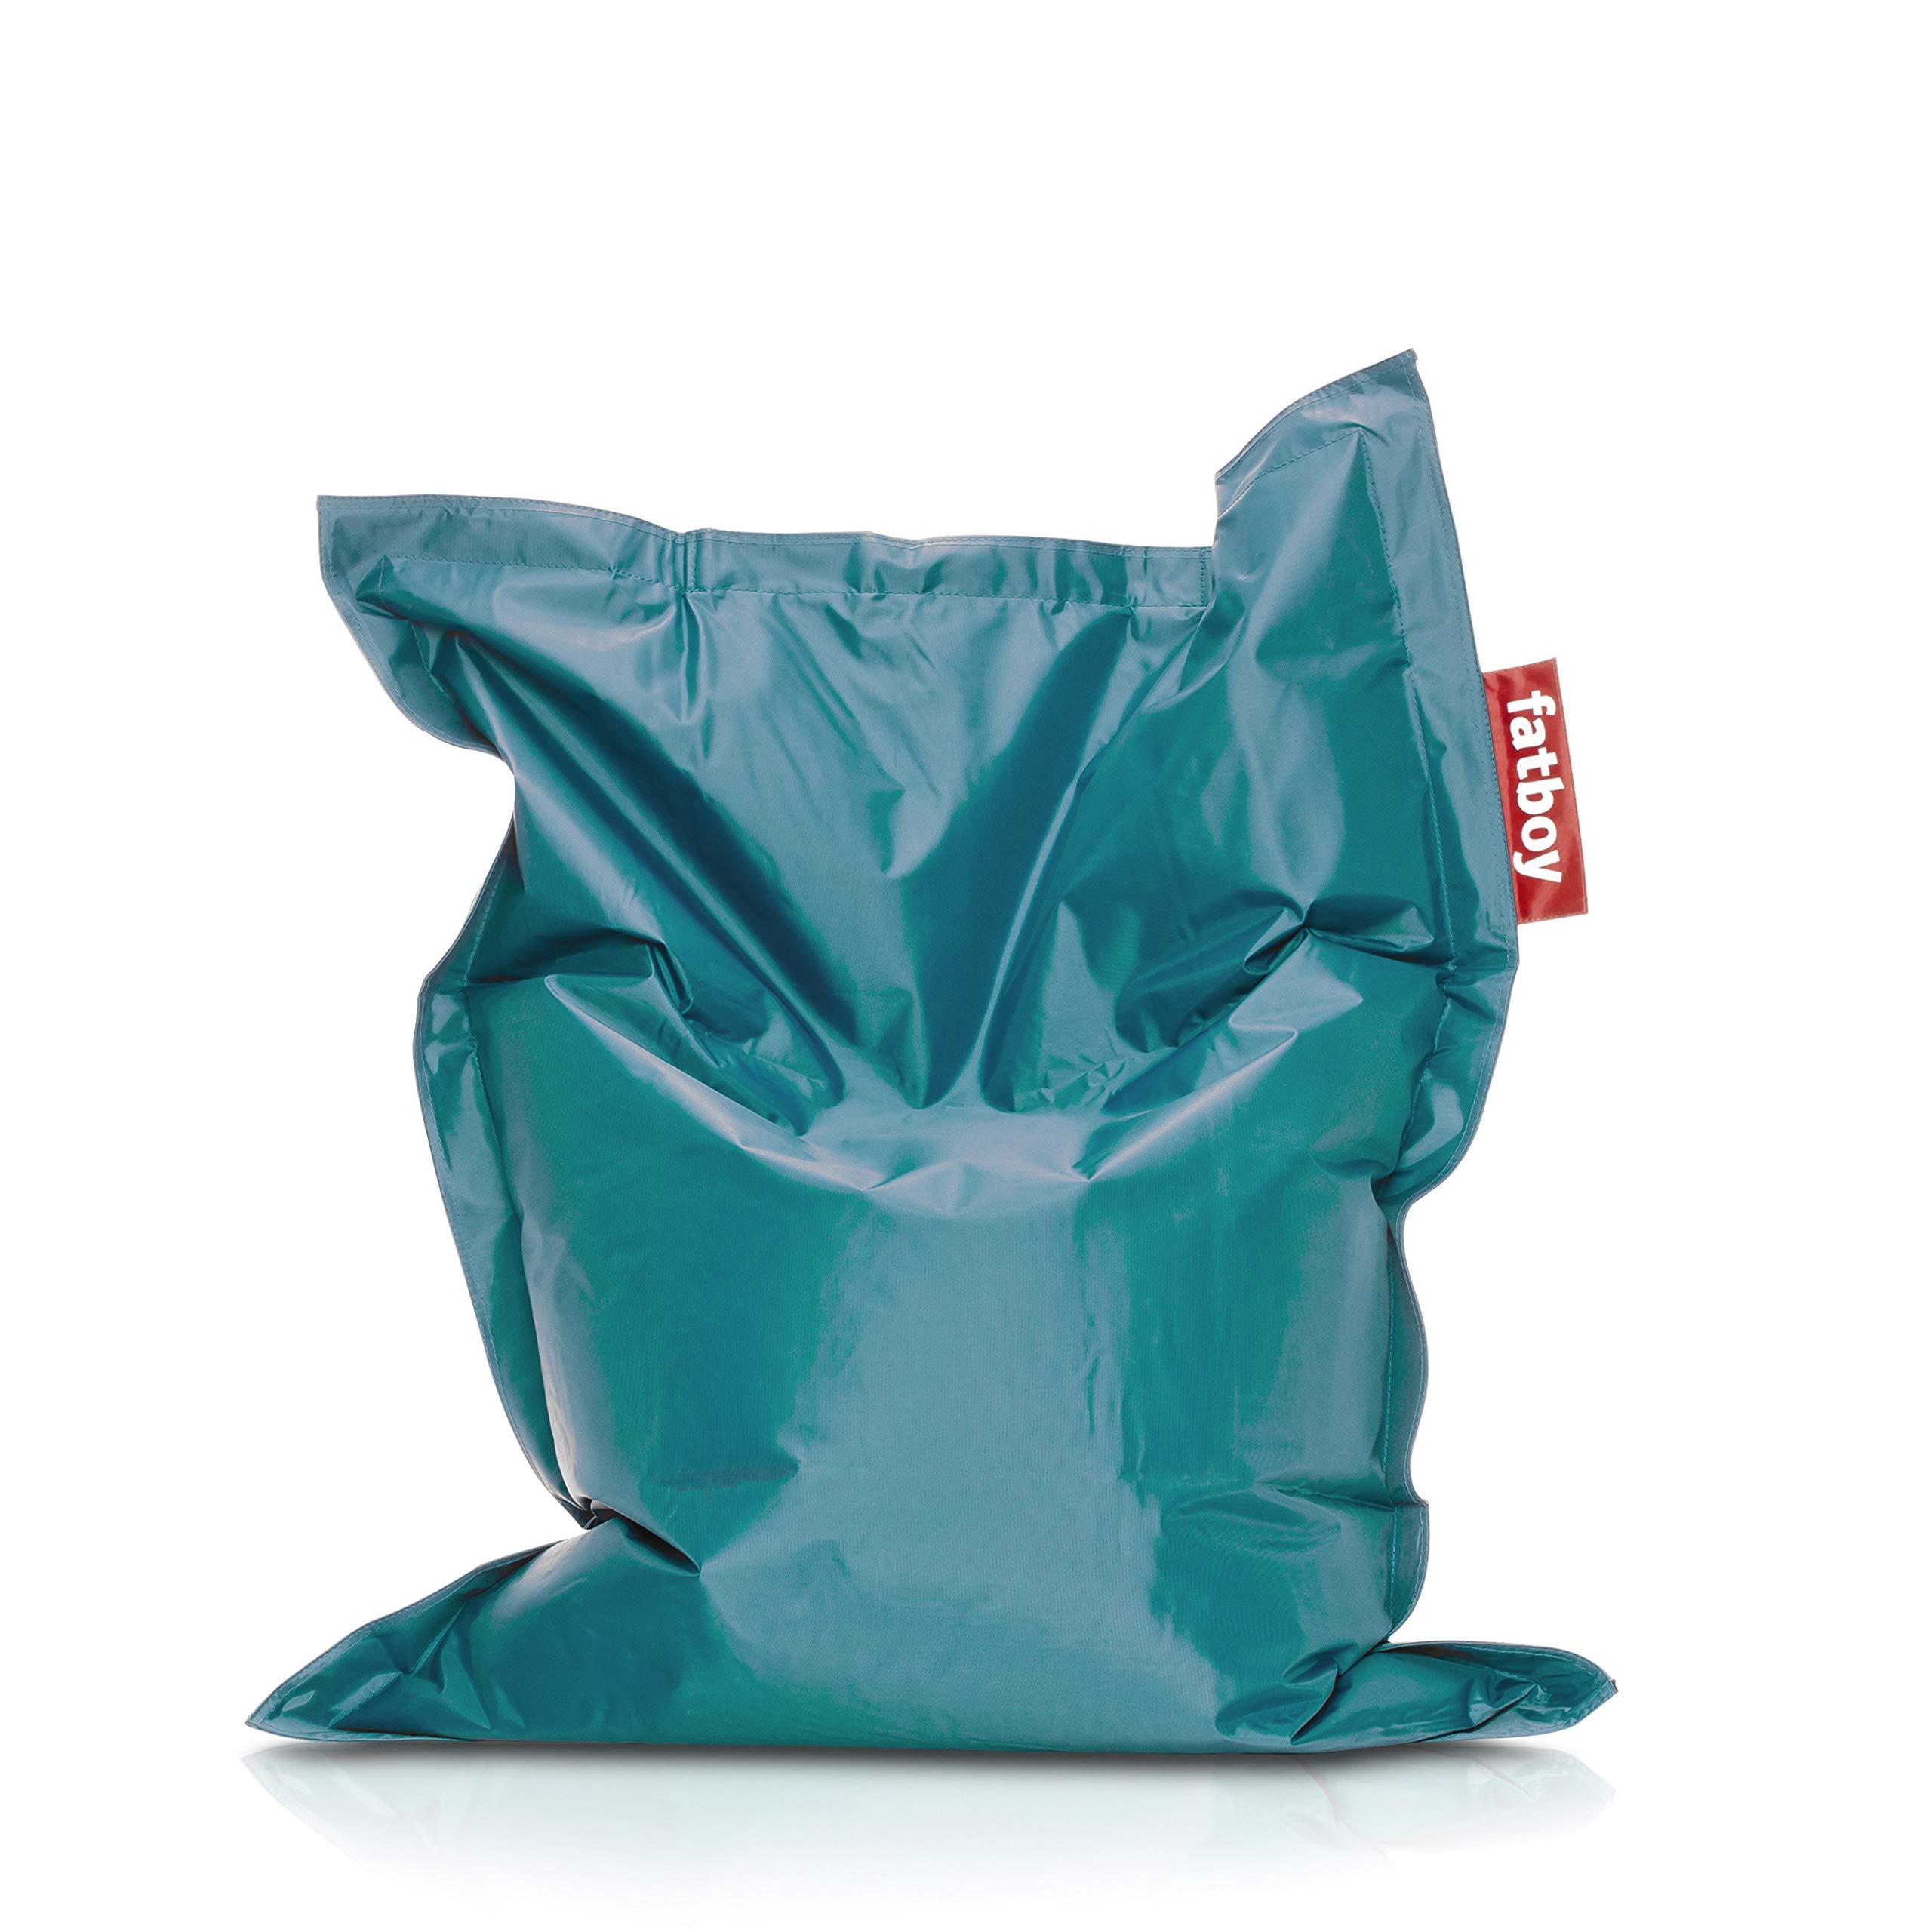 Fatboy USA Original Slim Bean Bag Chair, Turquoise by Fatboy USA